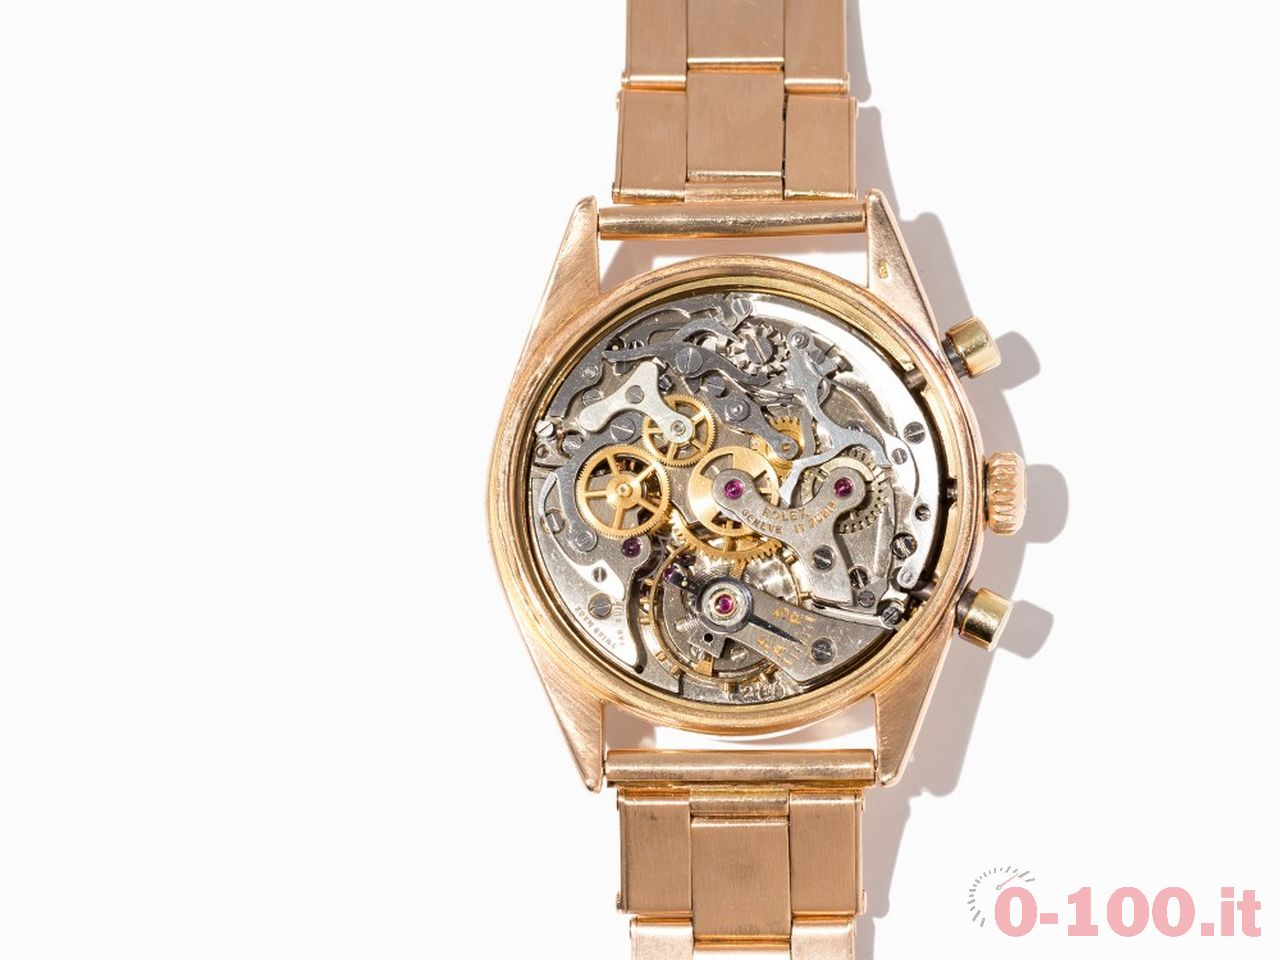 auctionata-rolex-oyster-chronograph-ref-6034-switzerland-around-1950-eric-claptons-collection_0-1005